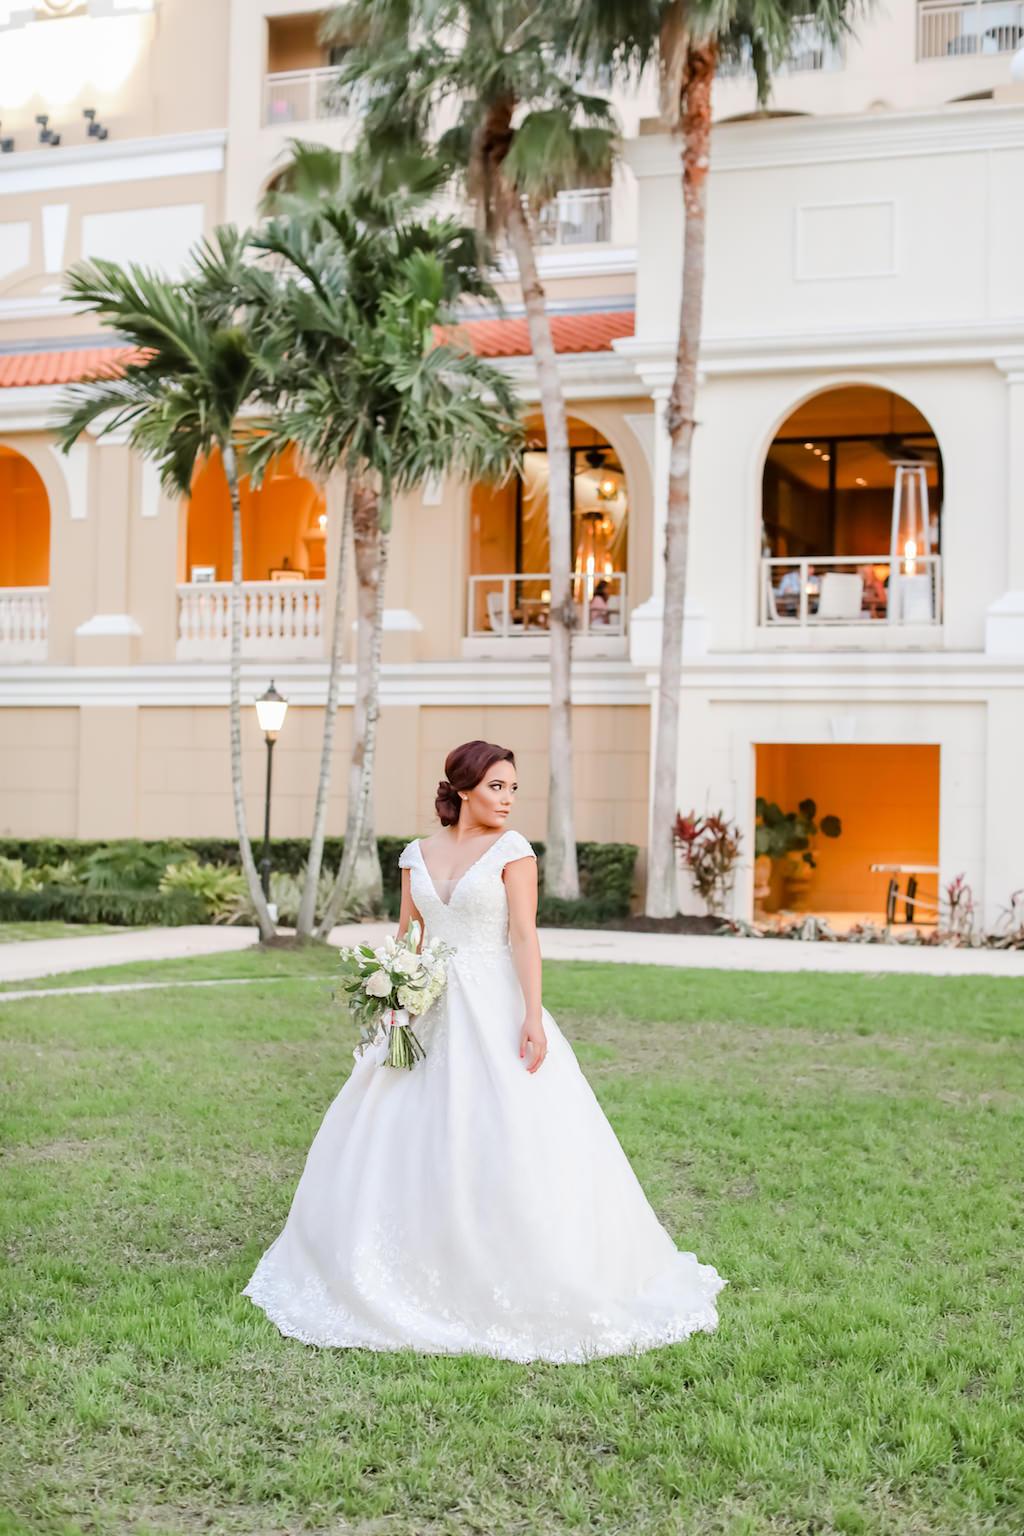 Elegant Cap Sleeve, Low Cut Neckline, White Ball Gown Style Wedding Dress   Truly Forever Bridal   The Ritz Carlton Sarasota   Tampa Bay Wedding Photographer Lifelong Photography Studios